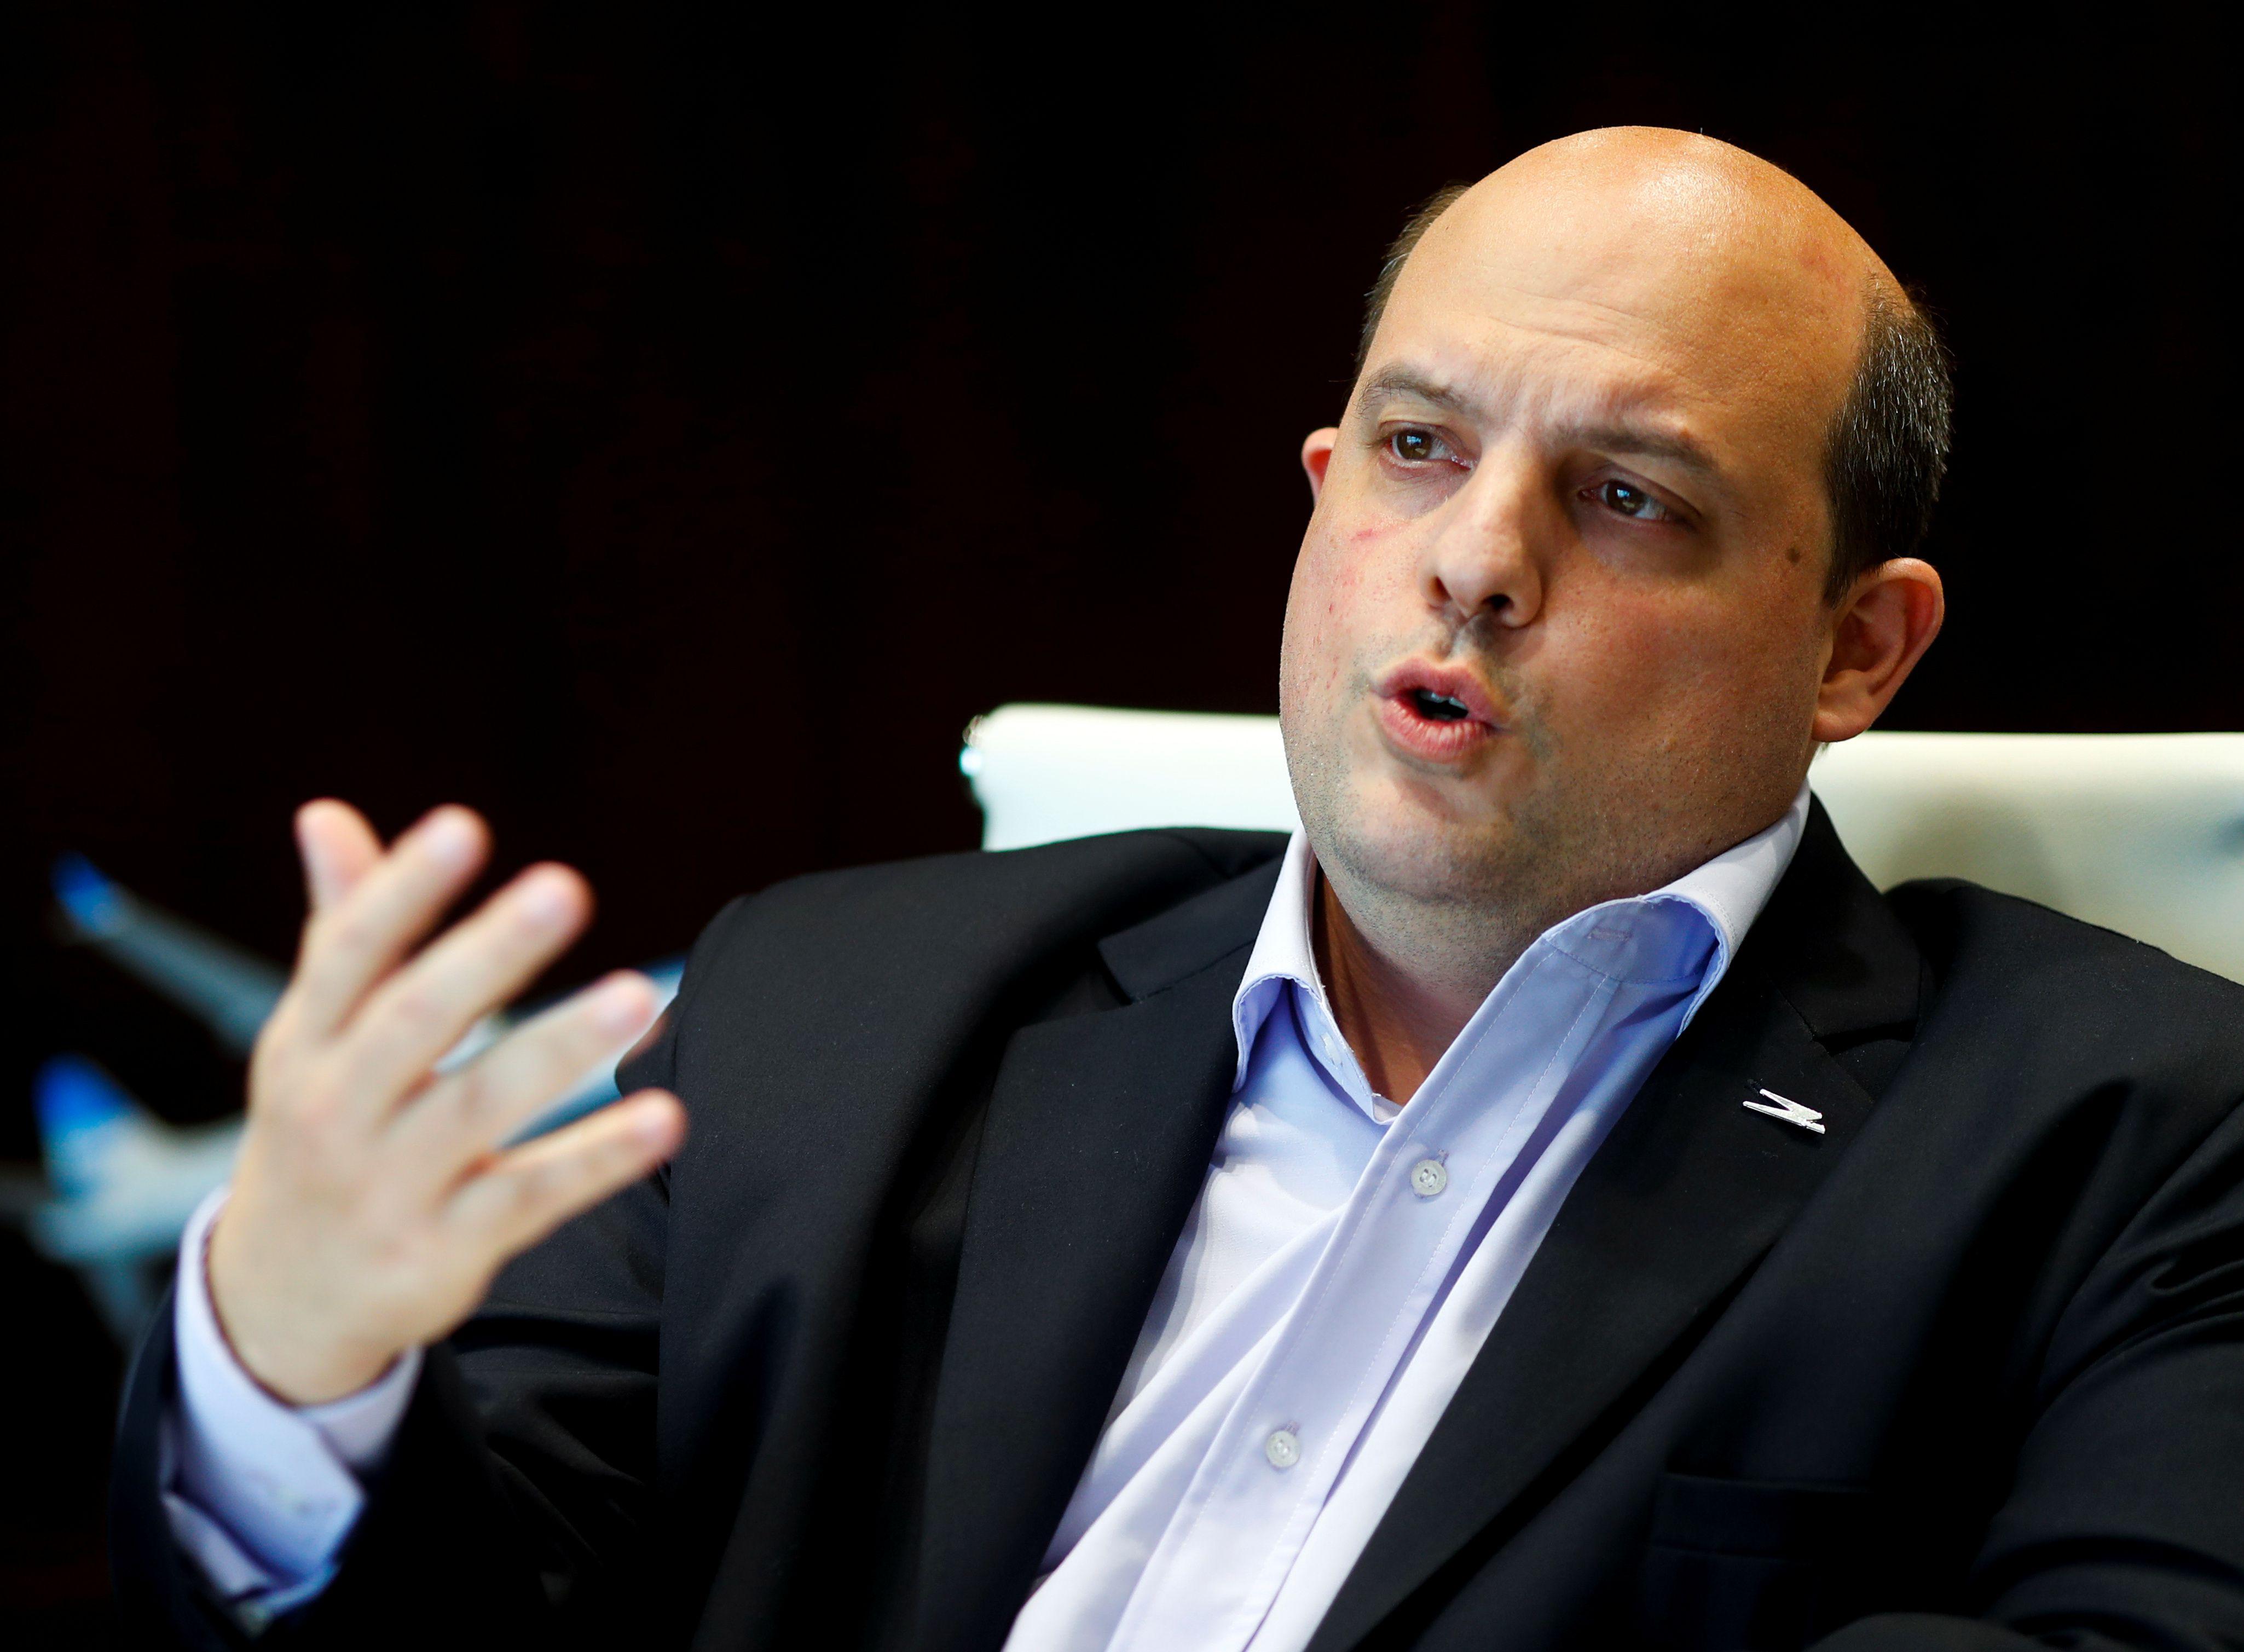 Pablo Ceriani, presidente de Aerolíneas Argentinas (REUTERS/Agustin Marcarian)